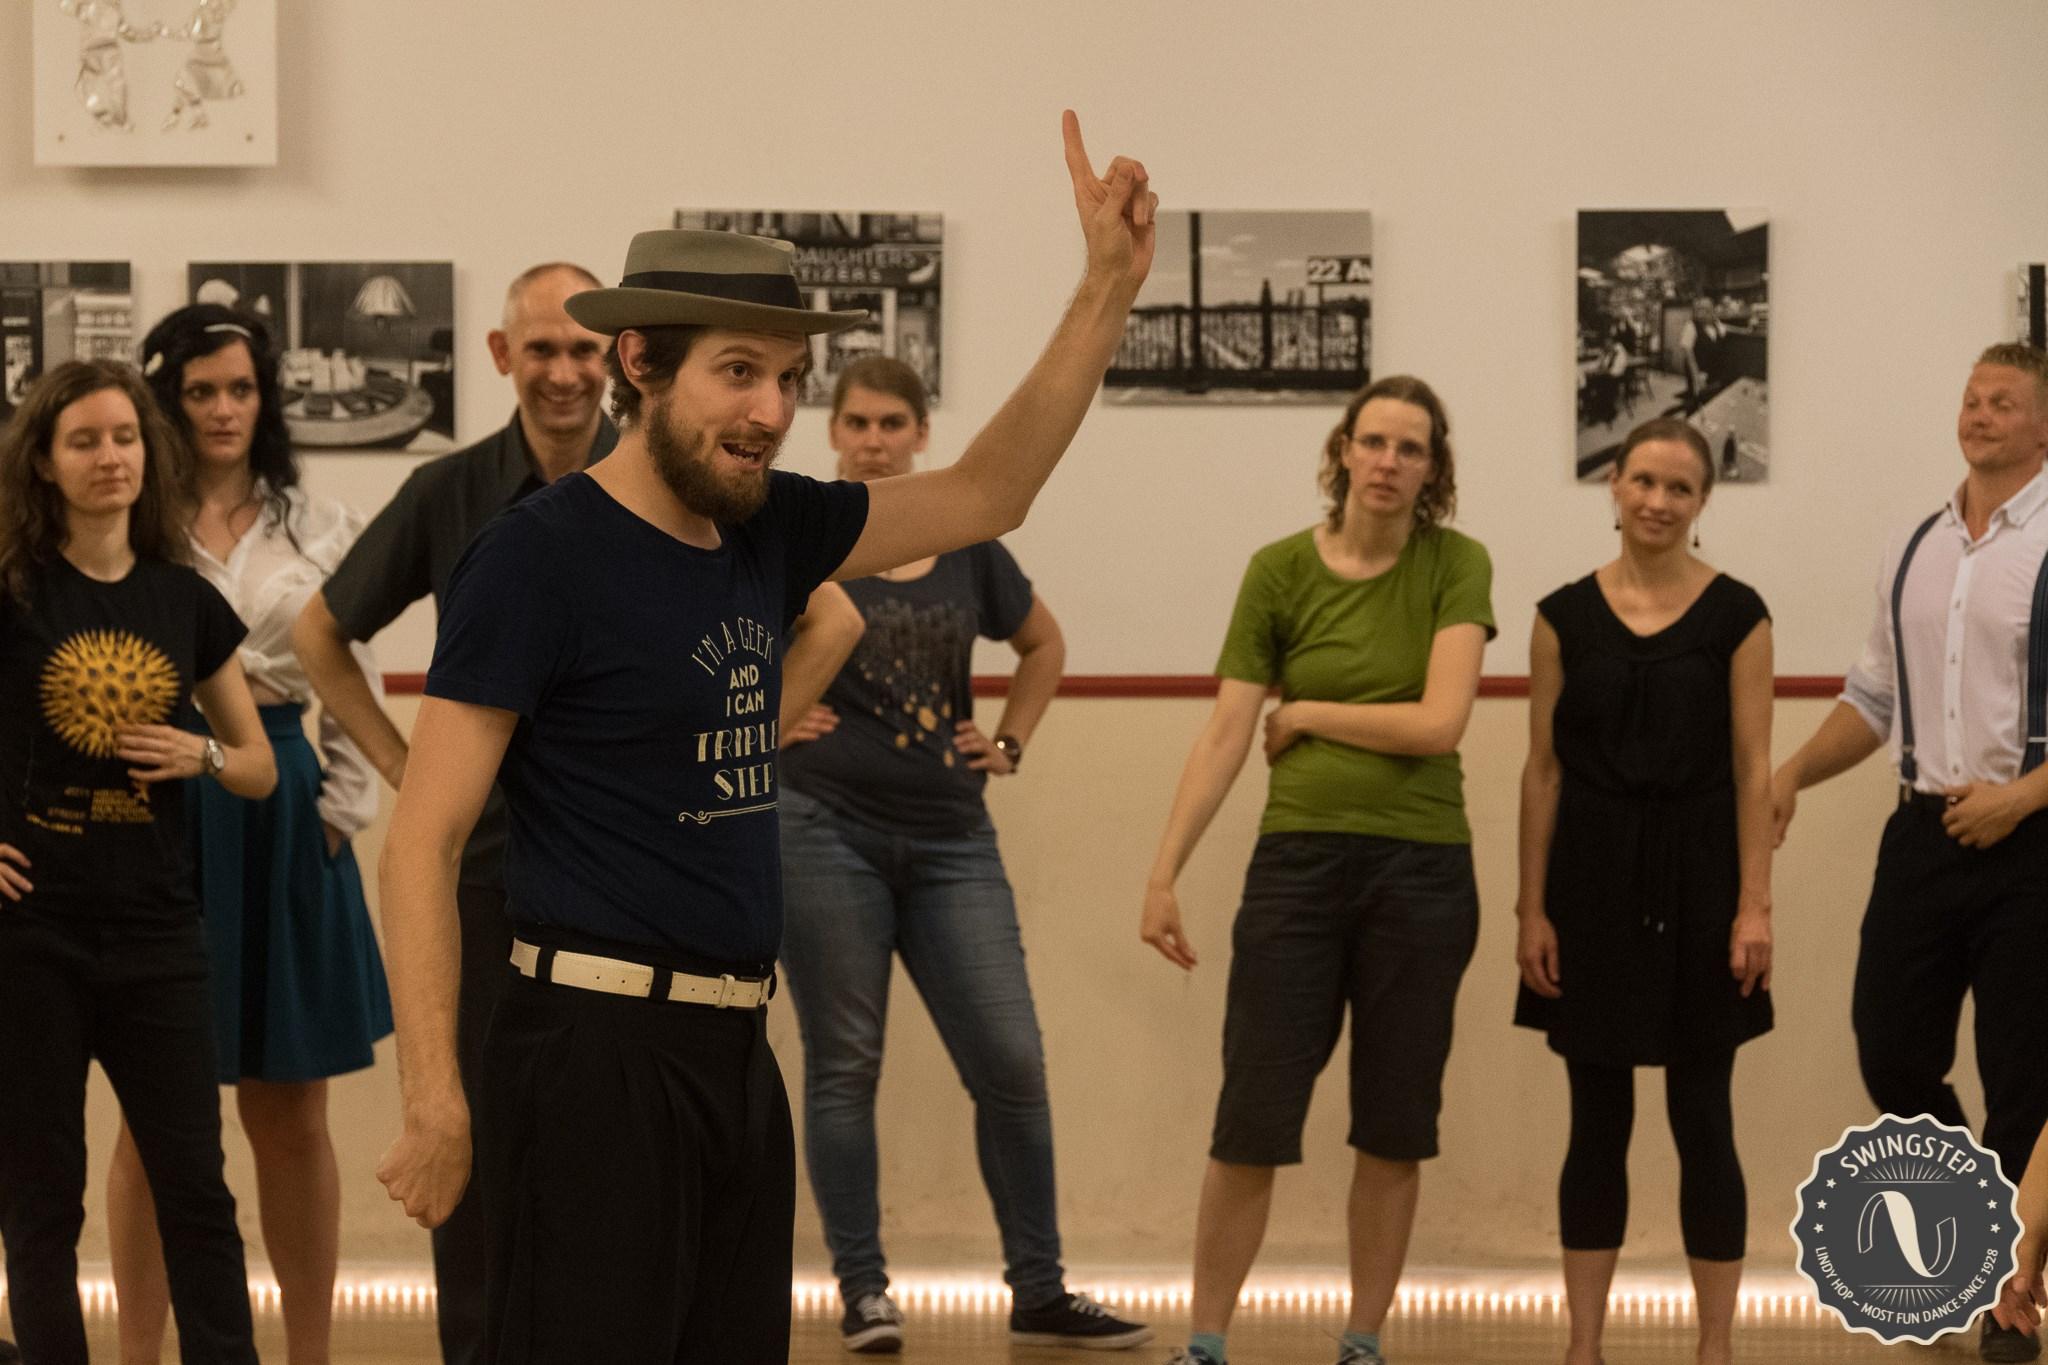 Tanzpädagoge Oliver Fuhrmann SwingStep Berlin